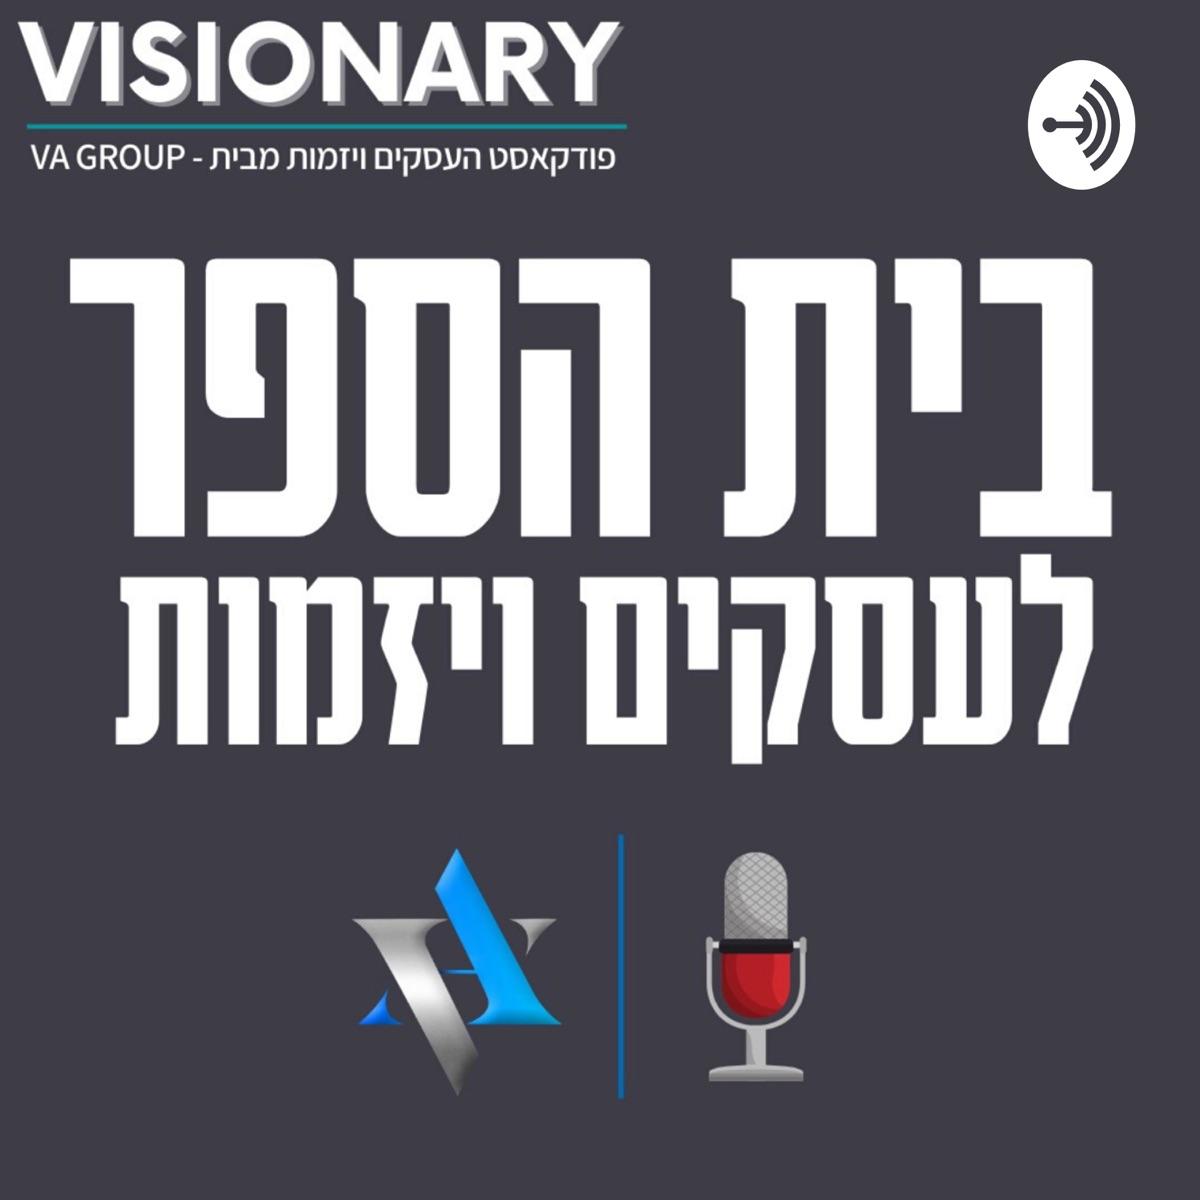 Visionary - ויז'ן גרופ הפודקאסט